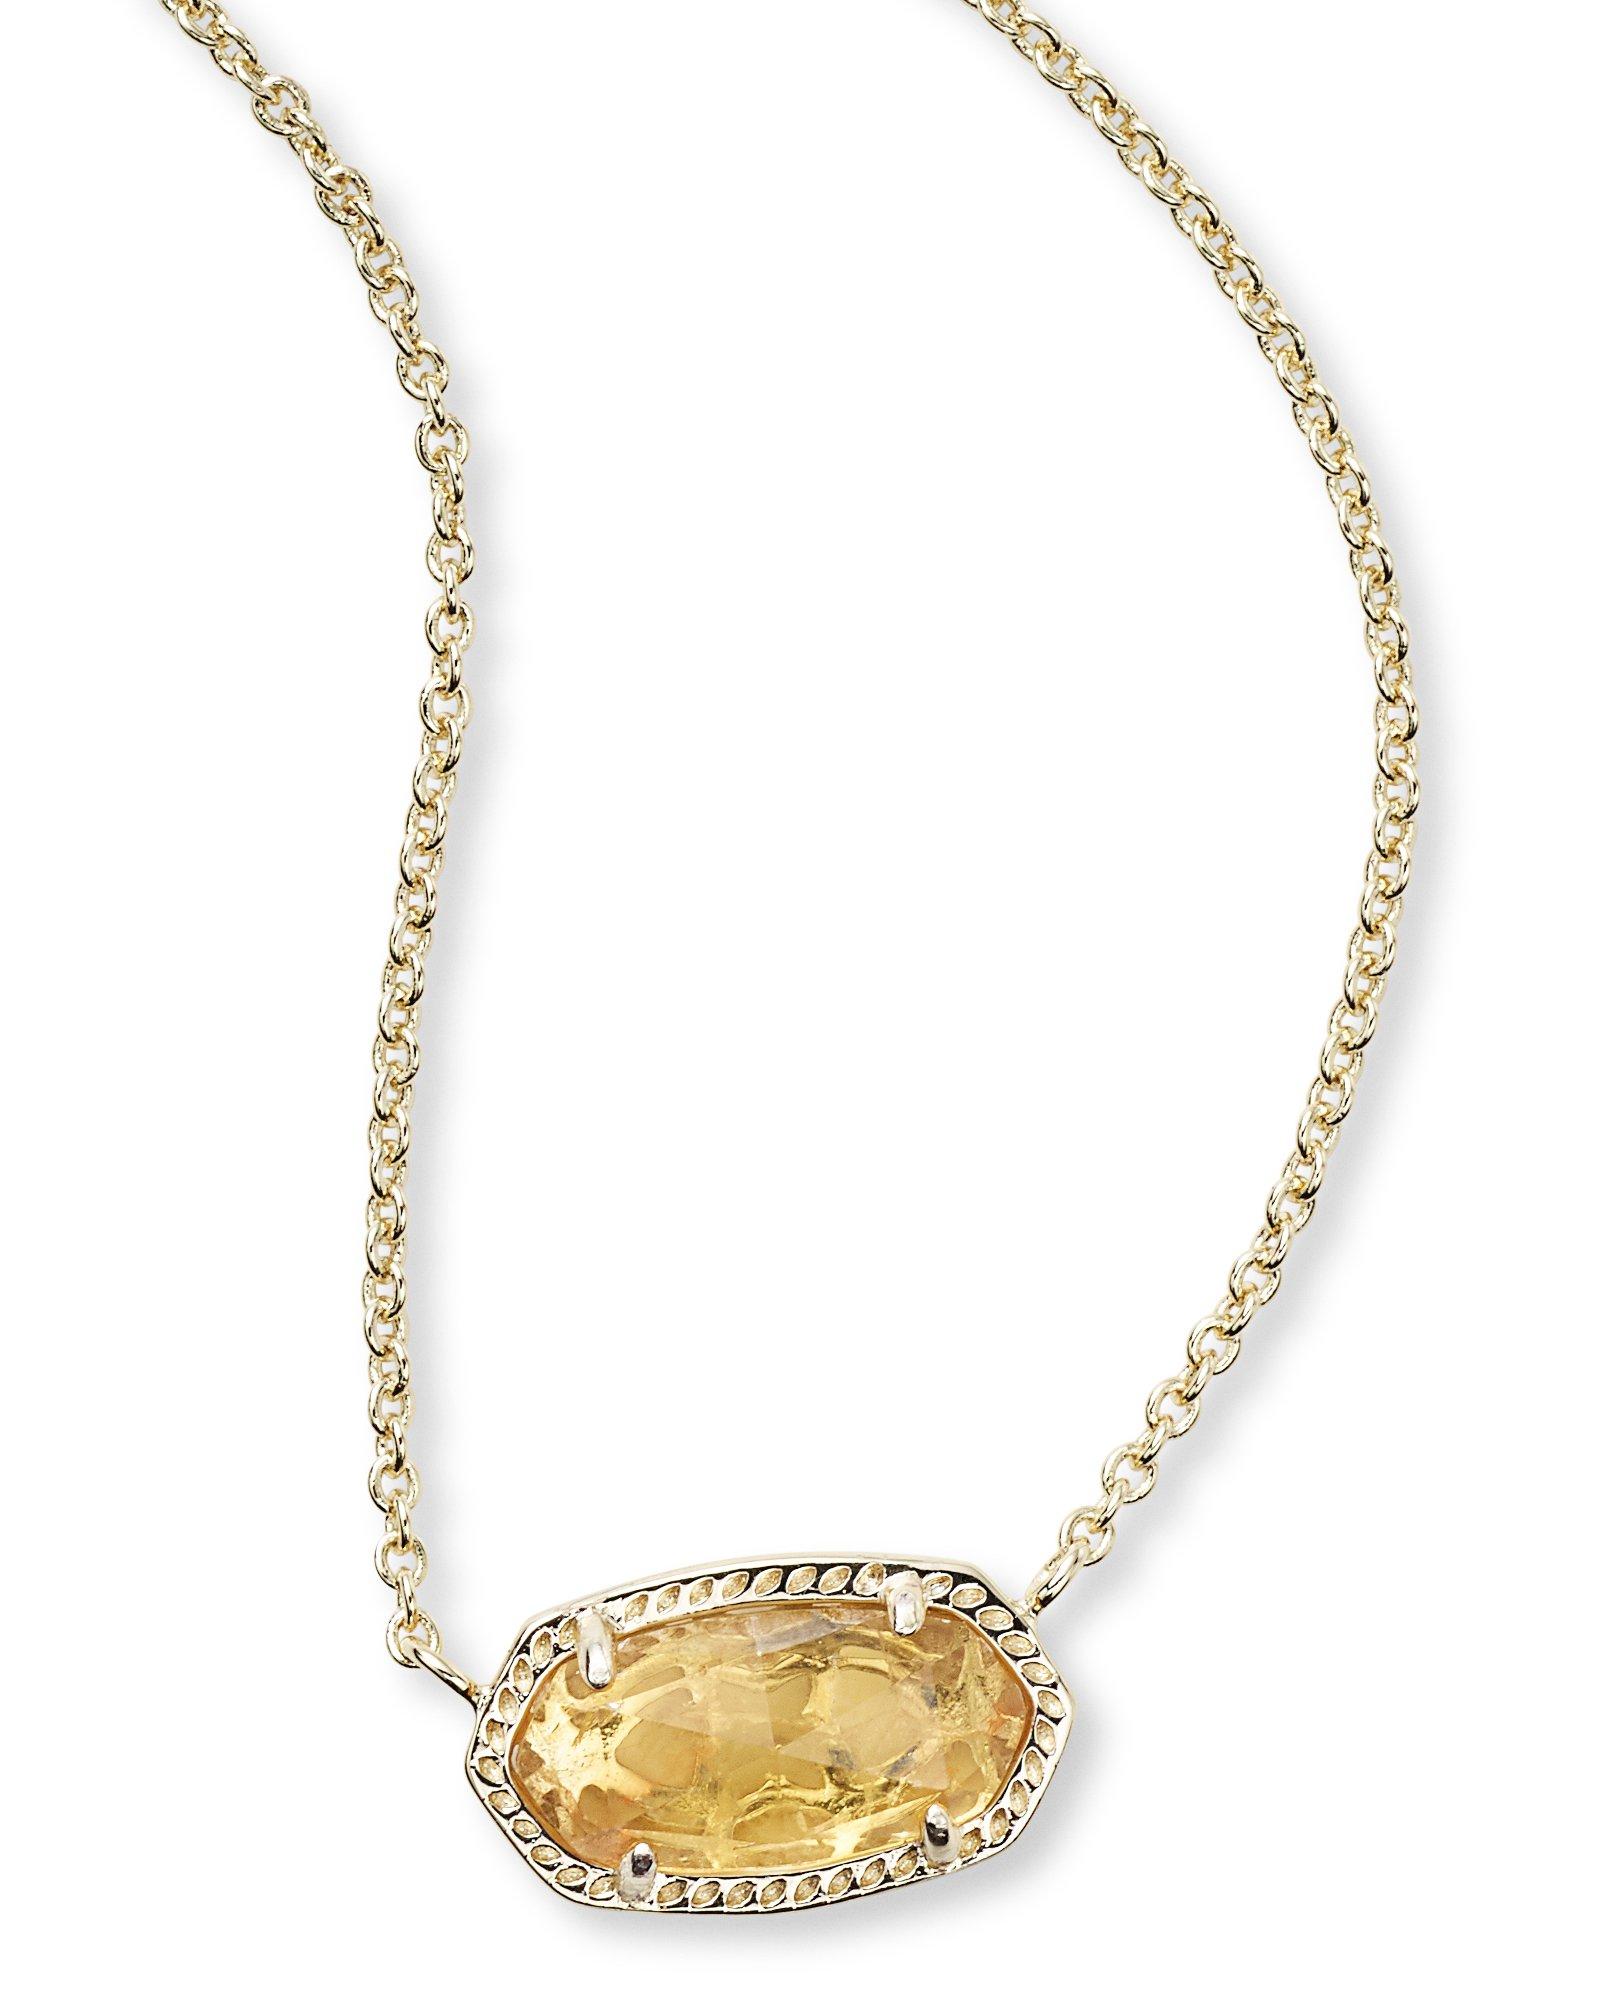 Kendra Scott Women's Elisa Birthstone Necklace November/Gold/Orange Citrine Quartz Necklace